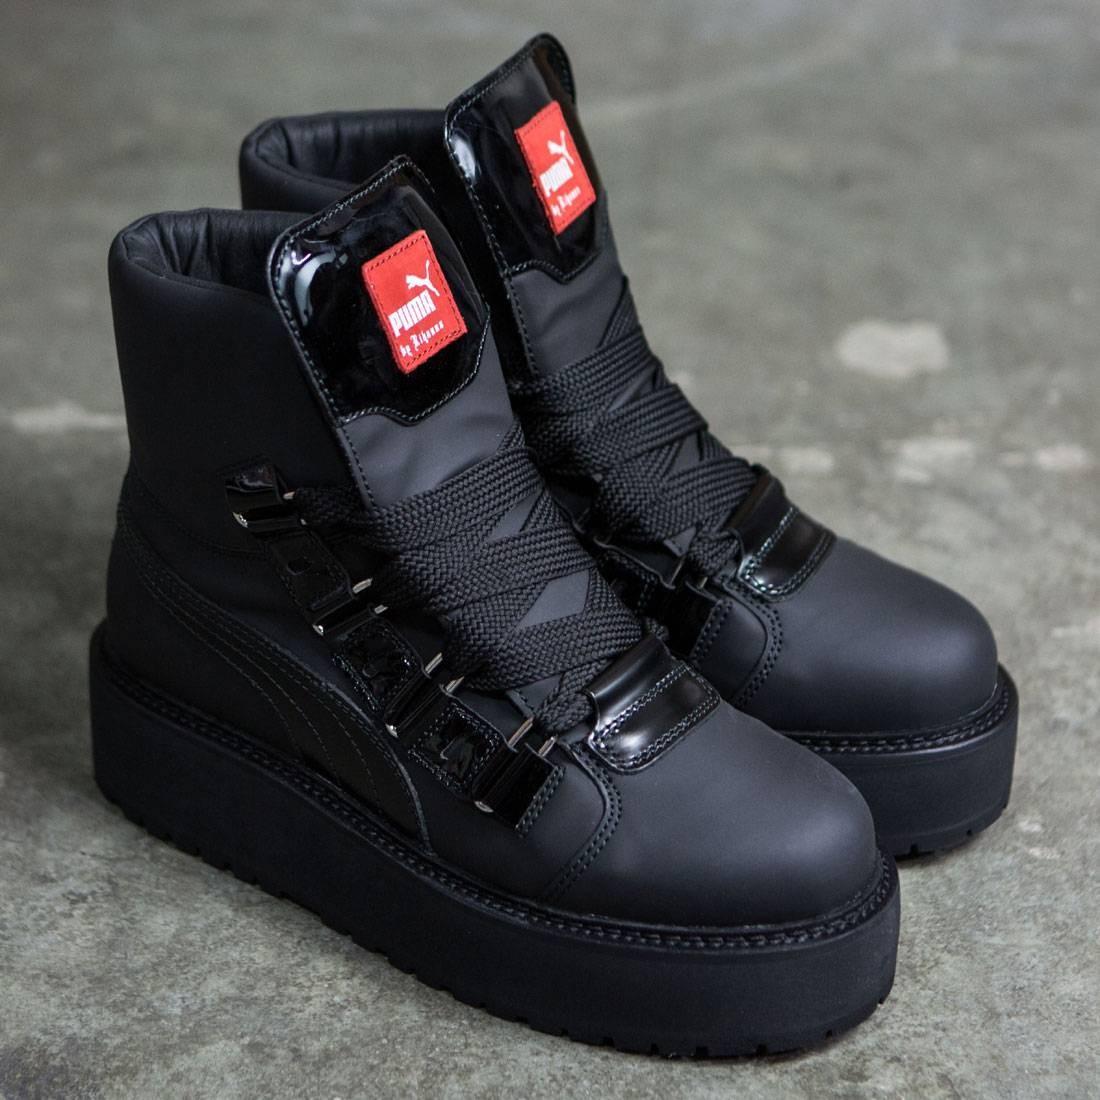 fenty x puma boots